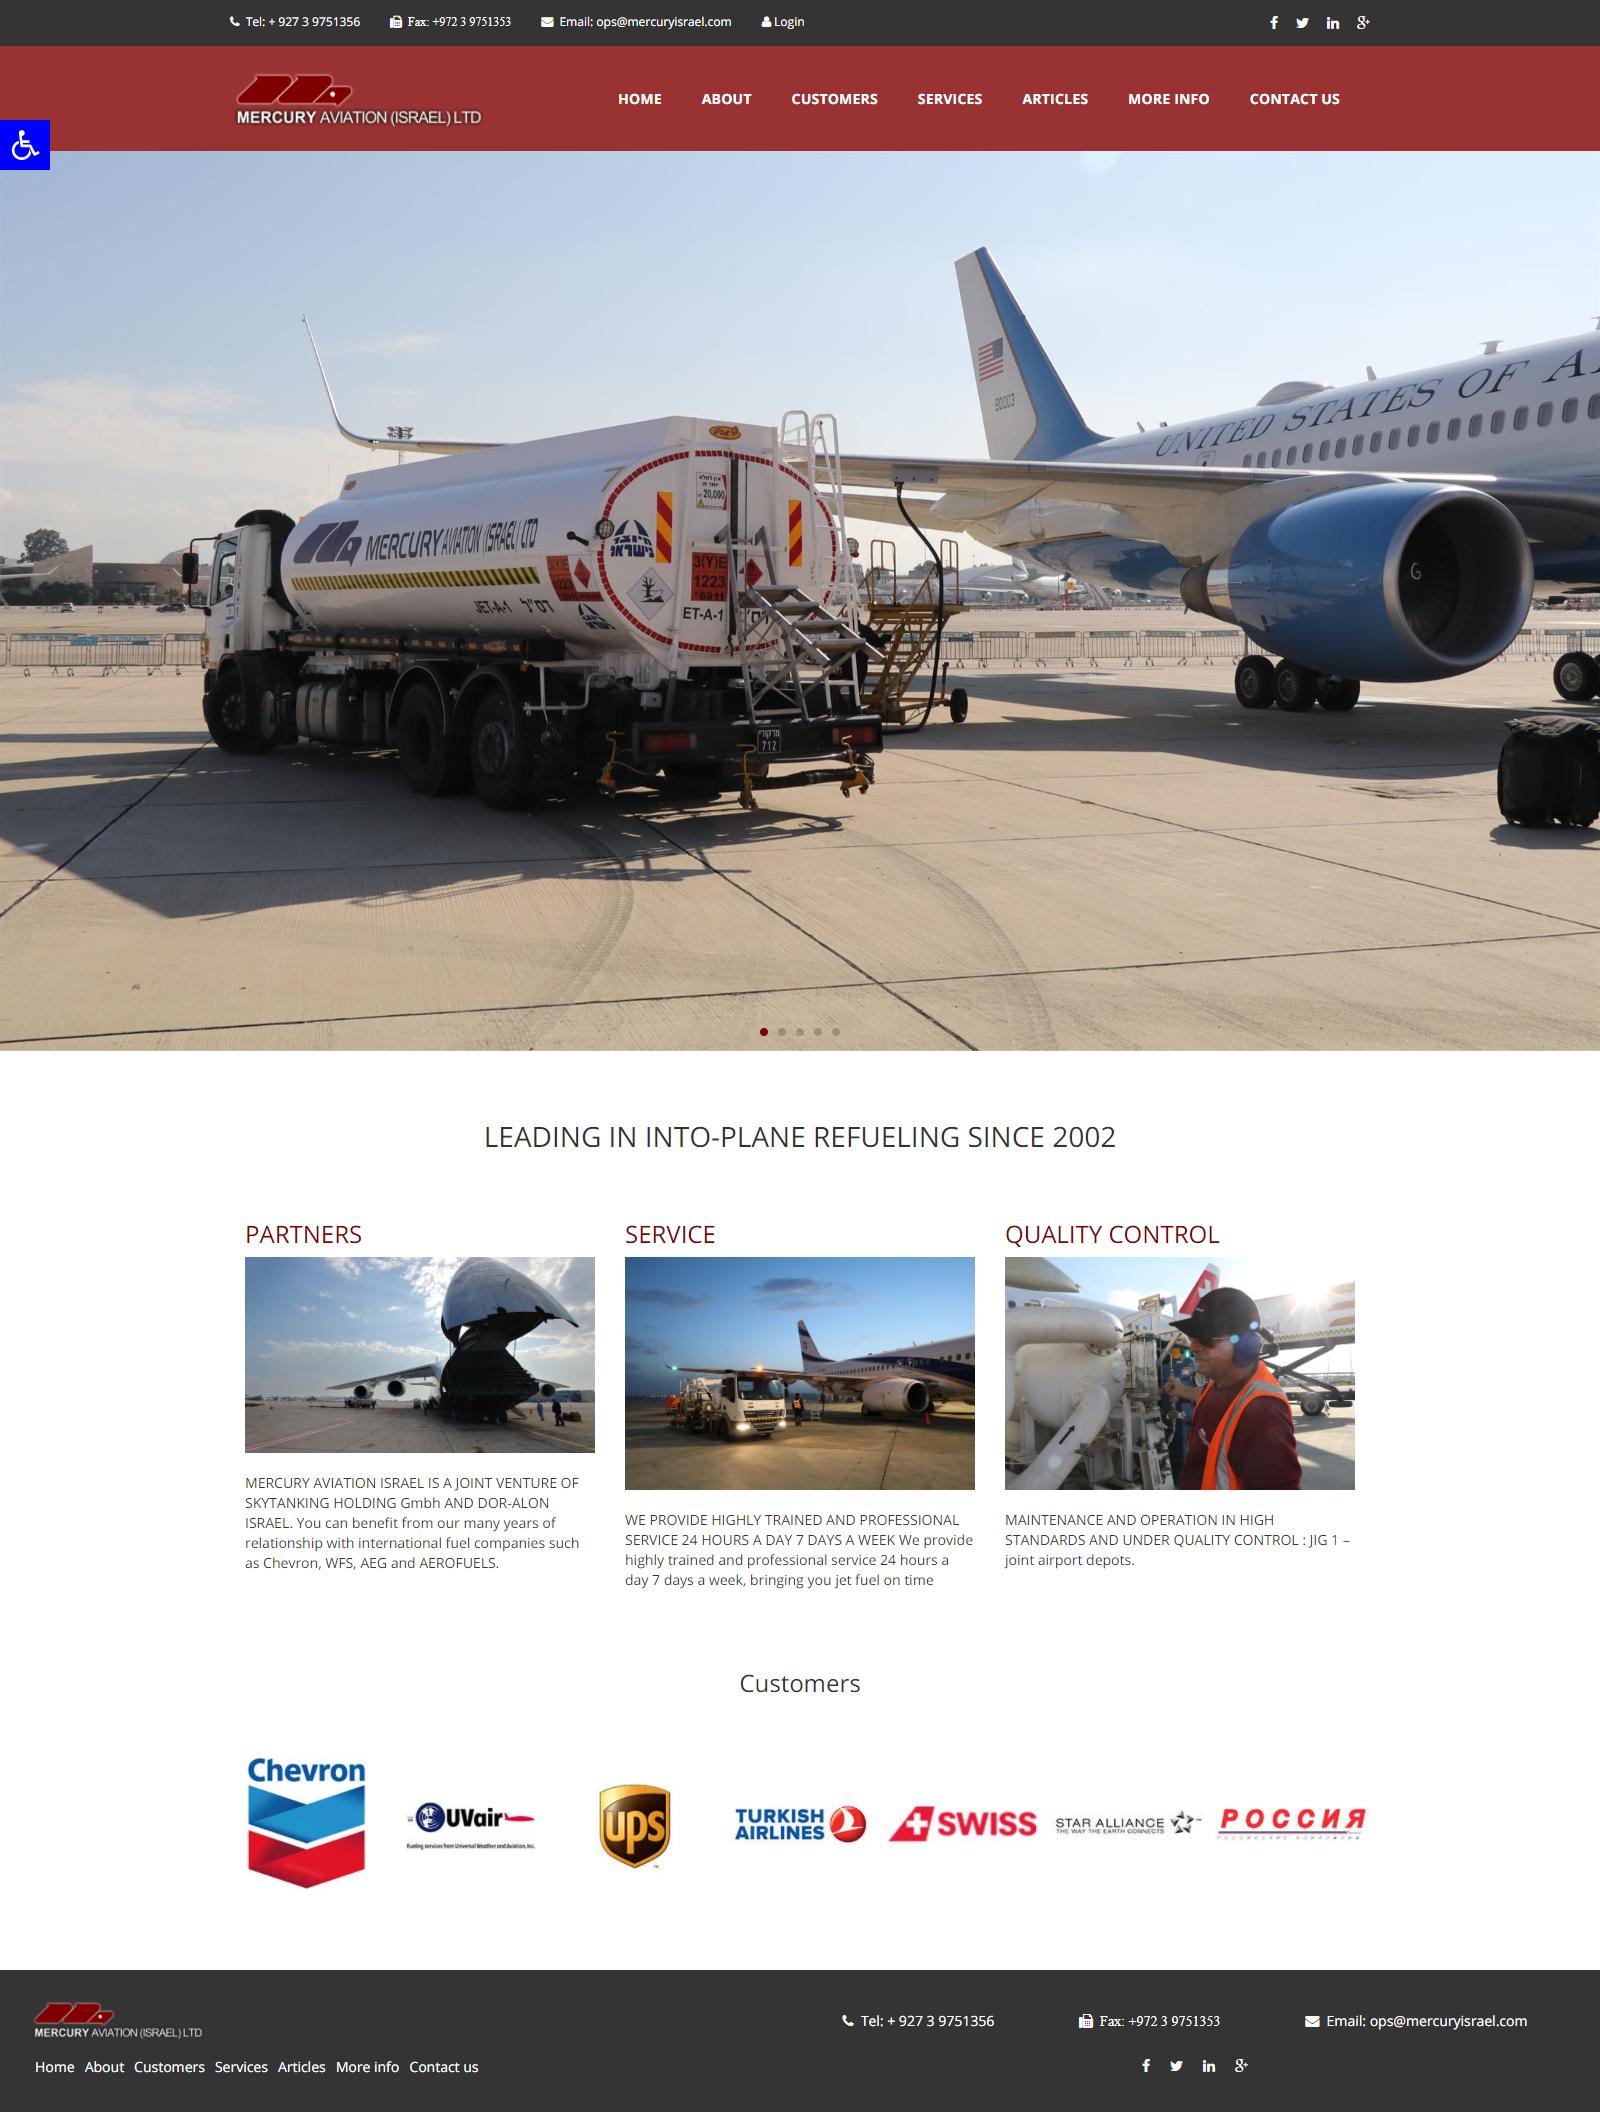 Mercury Aviation Israel Ltd